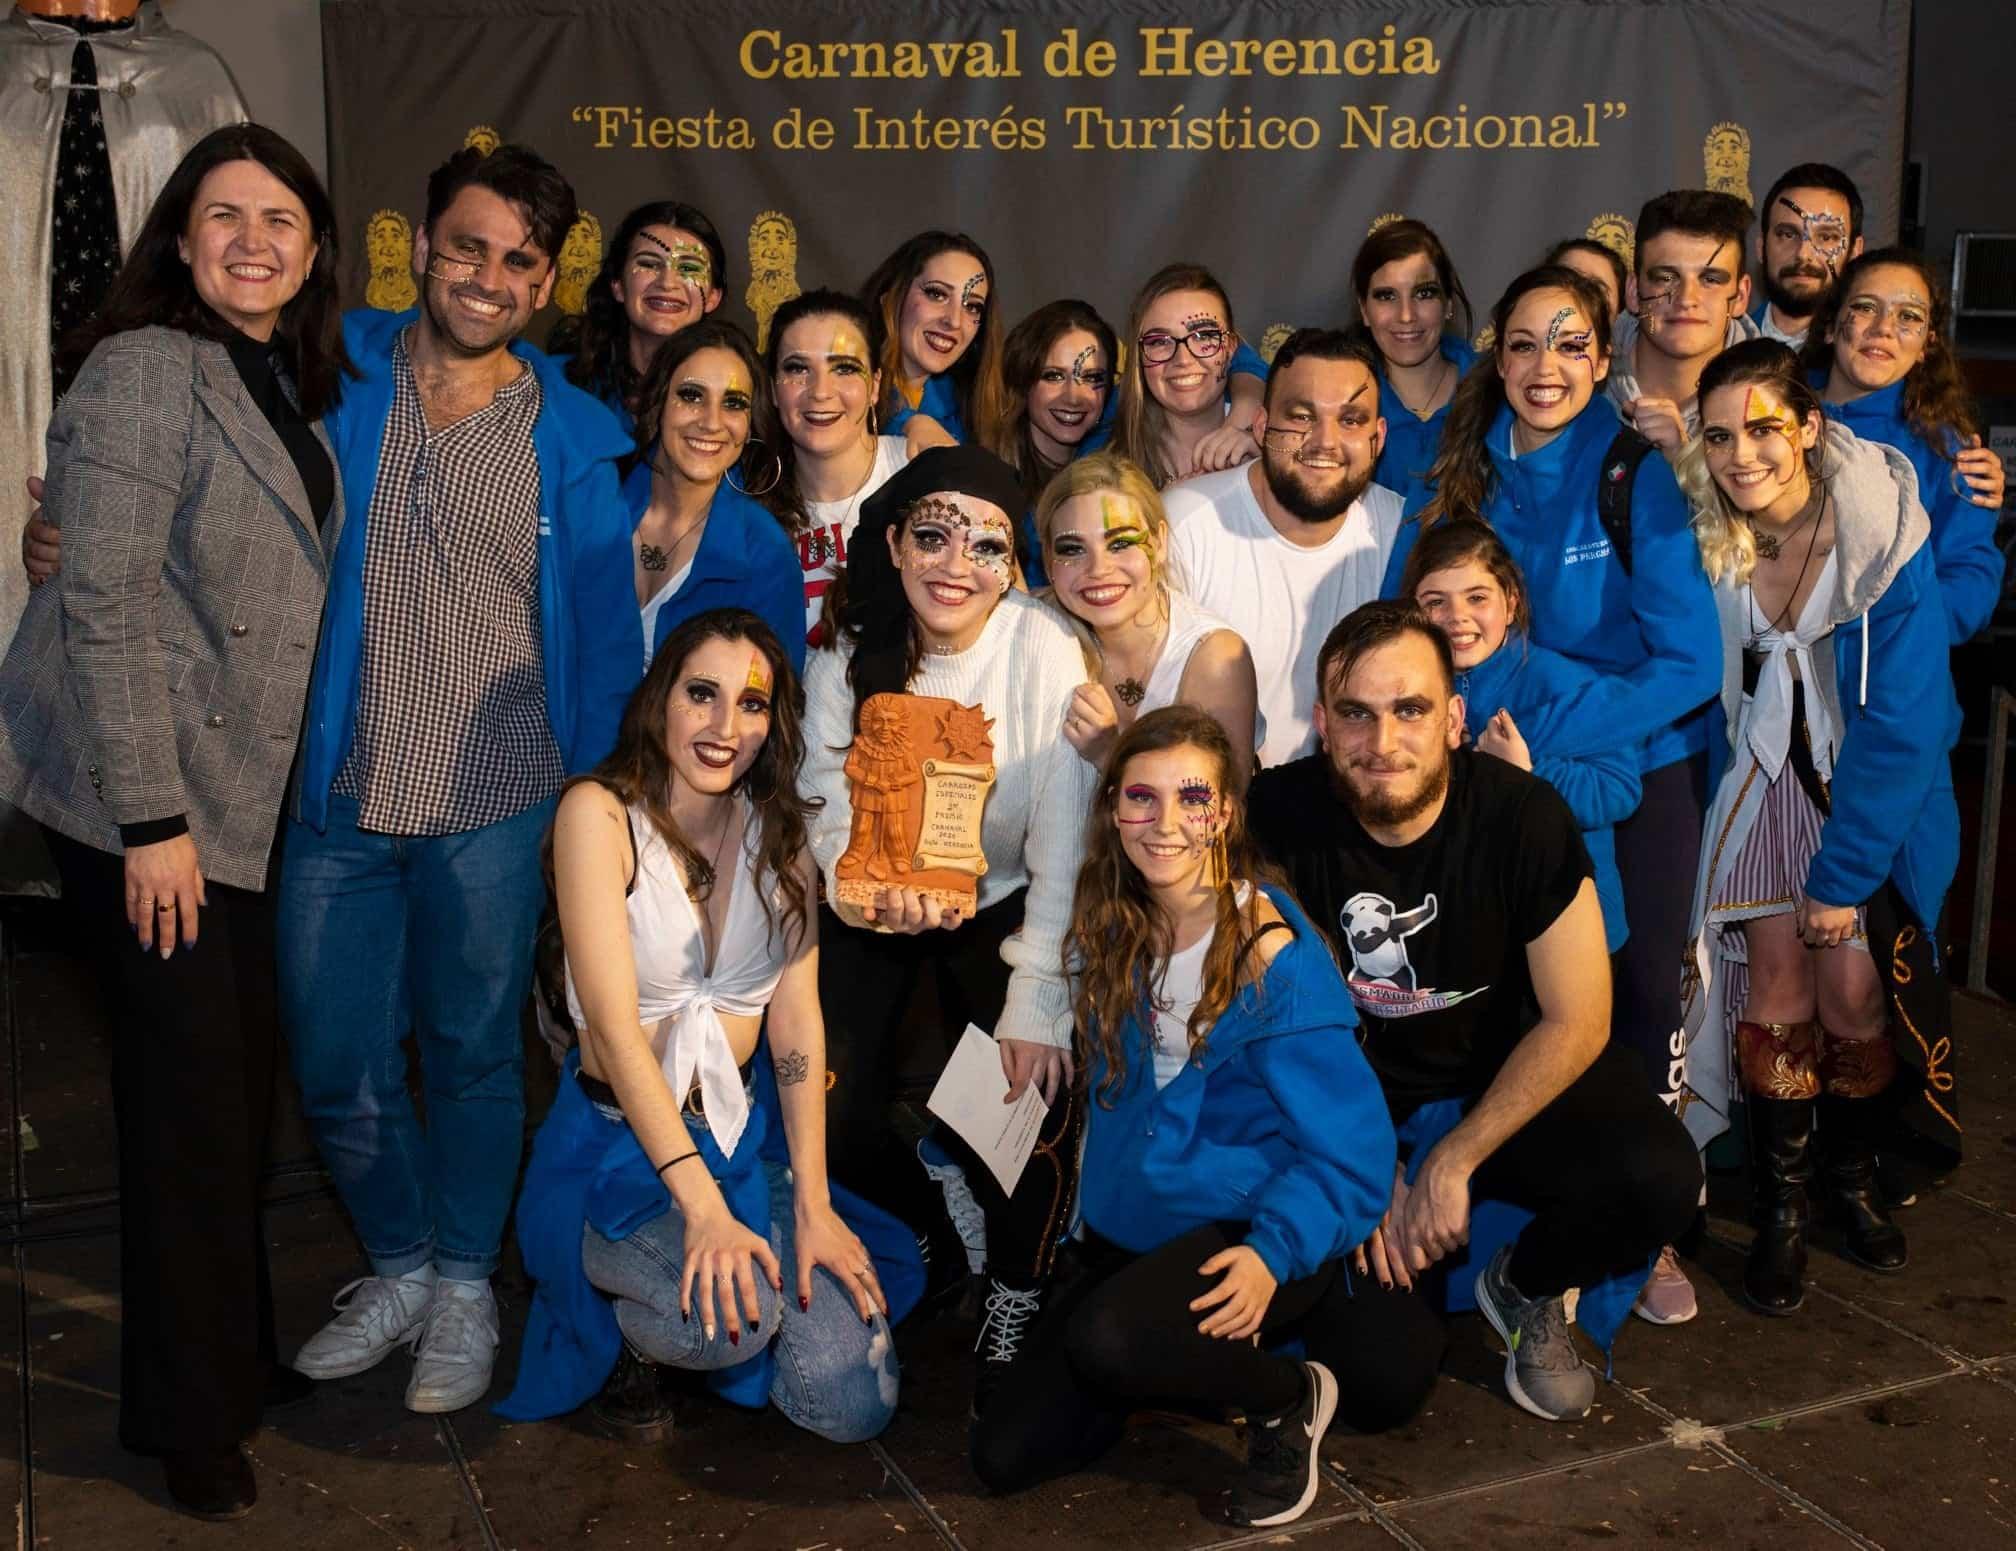 Carnaval de herencia 2020 ofertorio 64 - Selección de fotografías del Ofertorio del Carnaval de Herencia